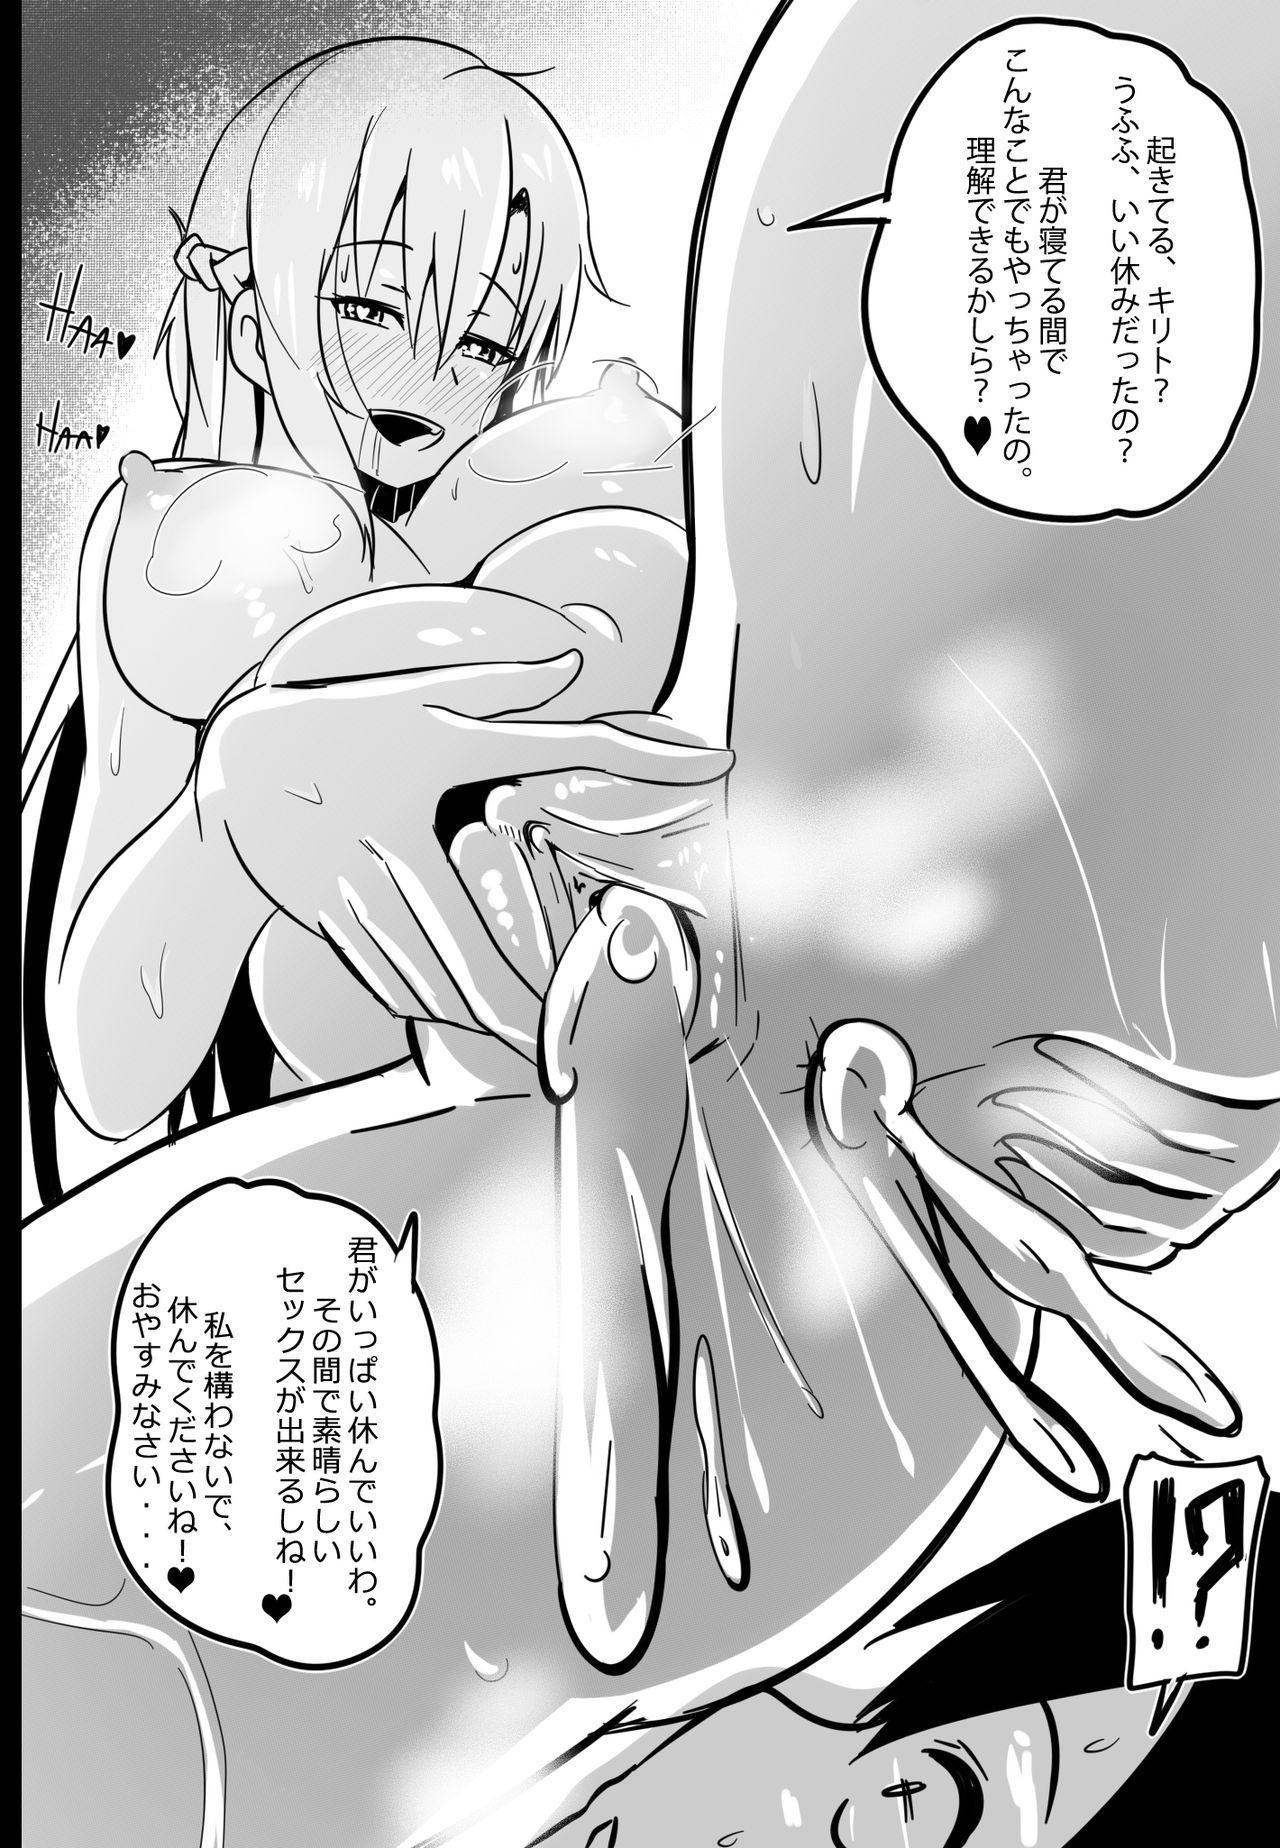 [Merkonig] B-Trayal 19-2 (Sword Art Online) 13